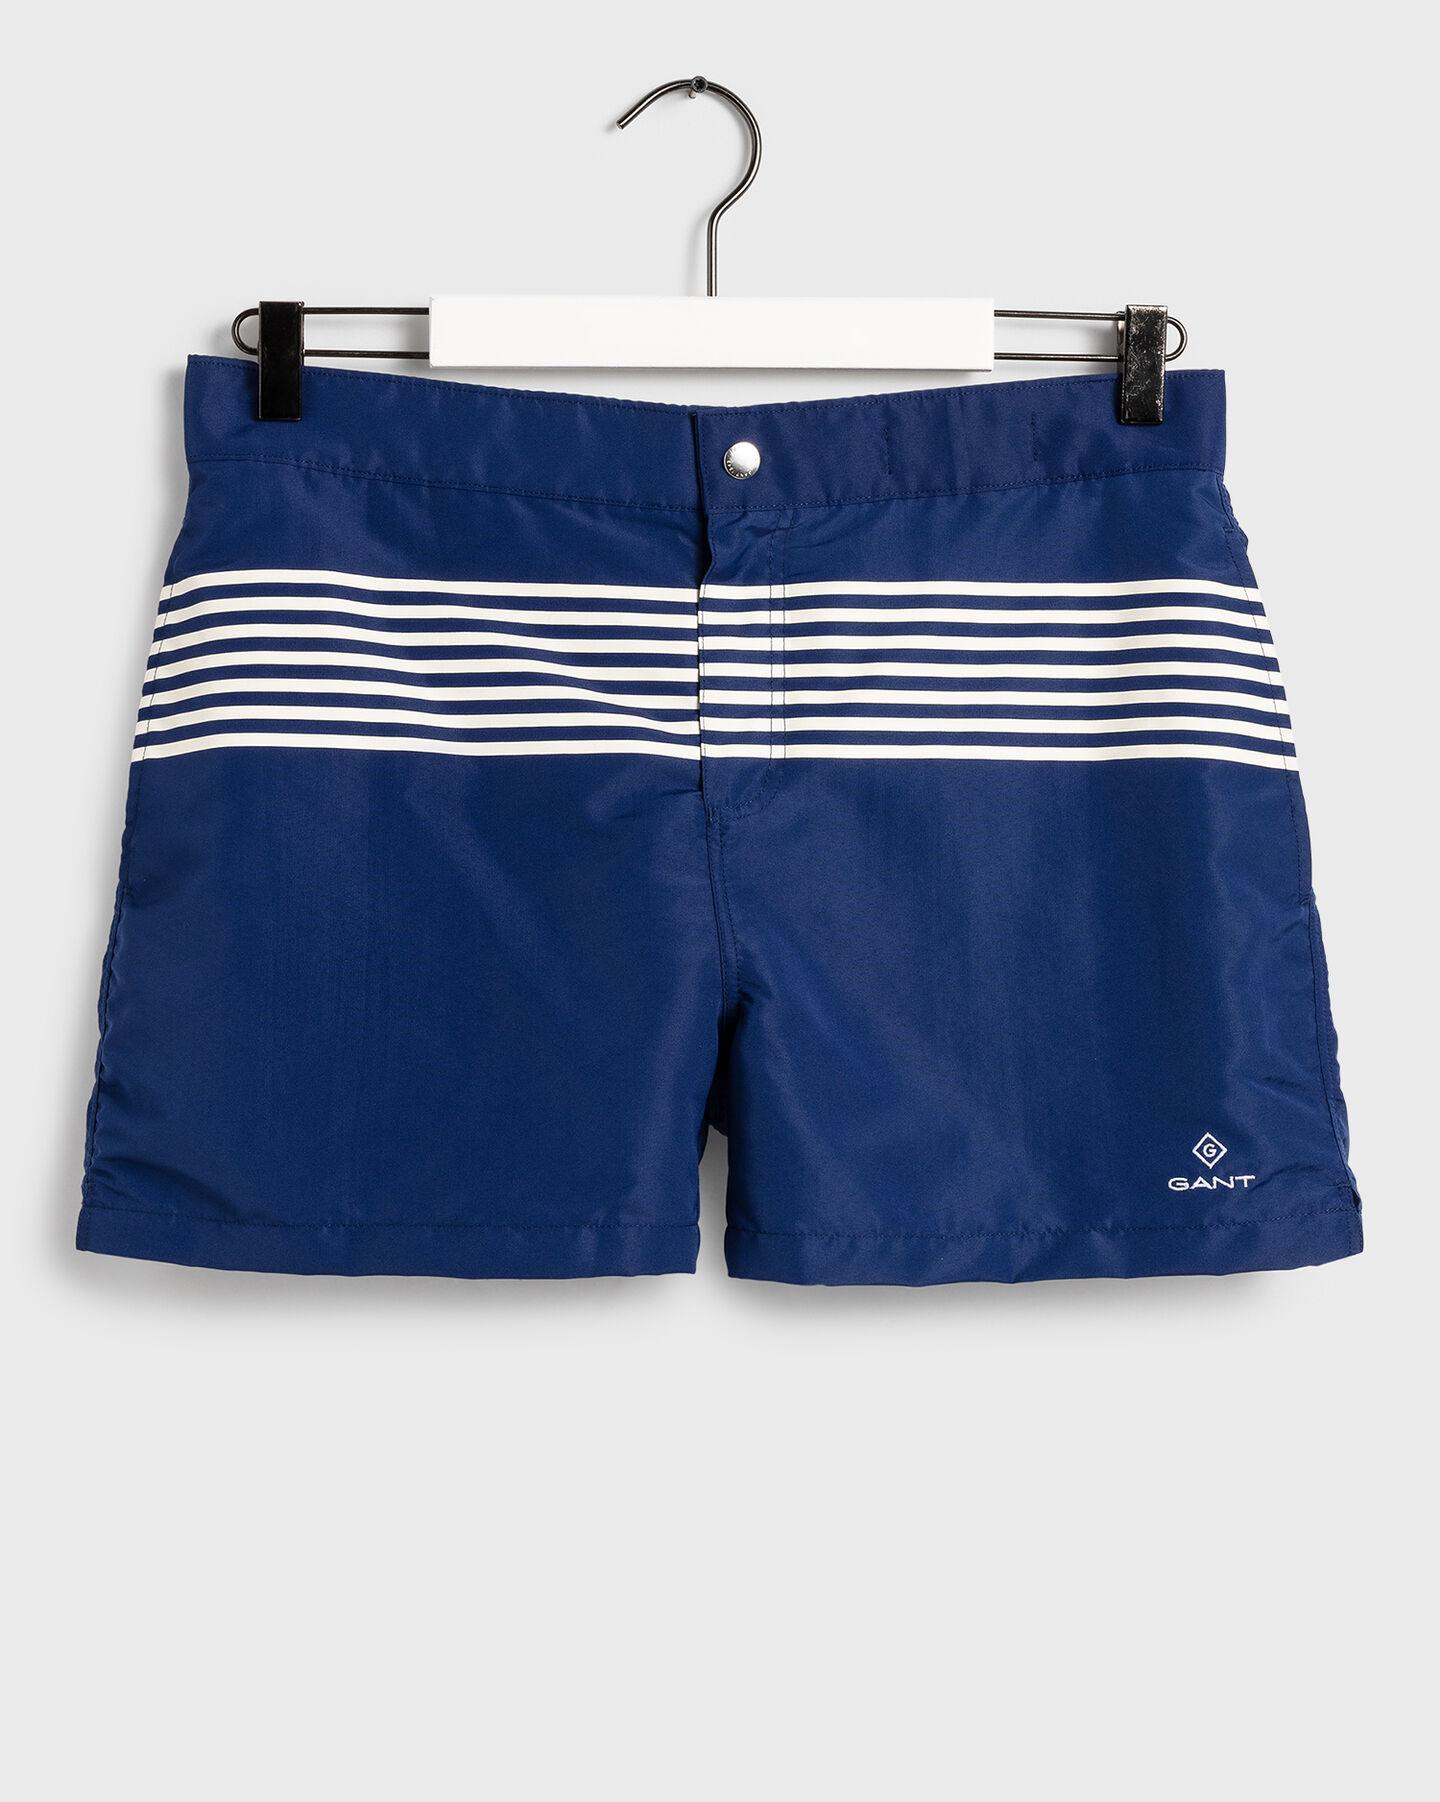 Ocean Prep 13 Stripes Swim Shorts